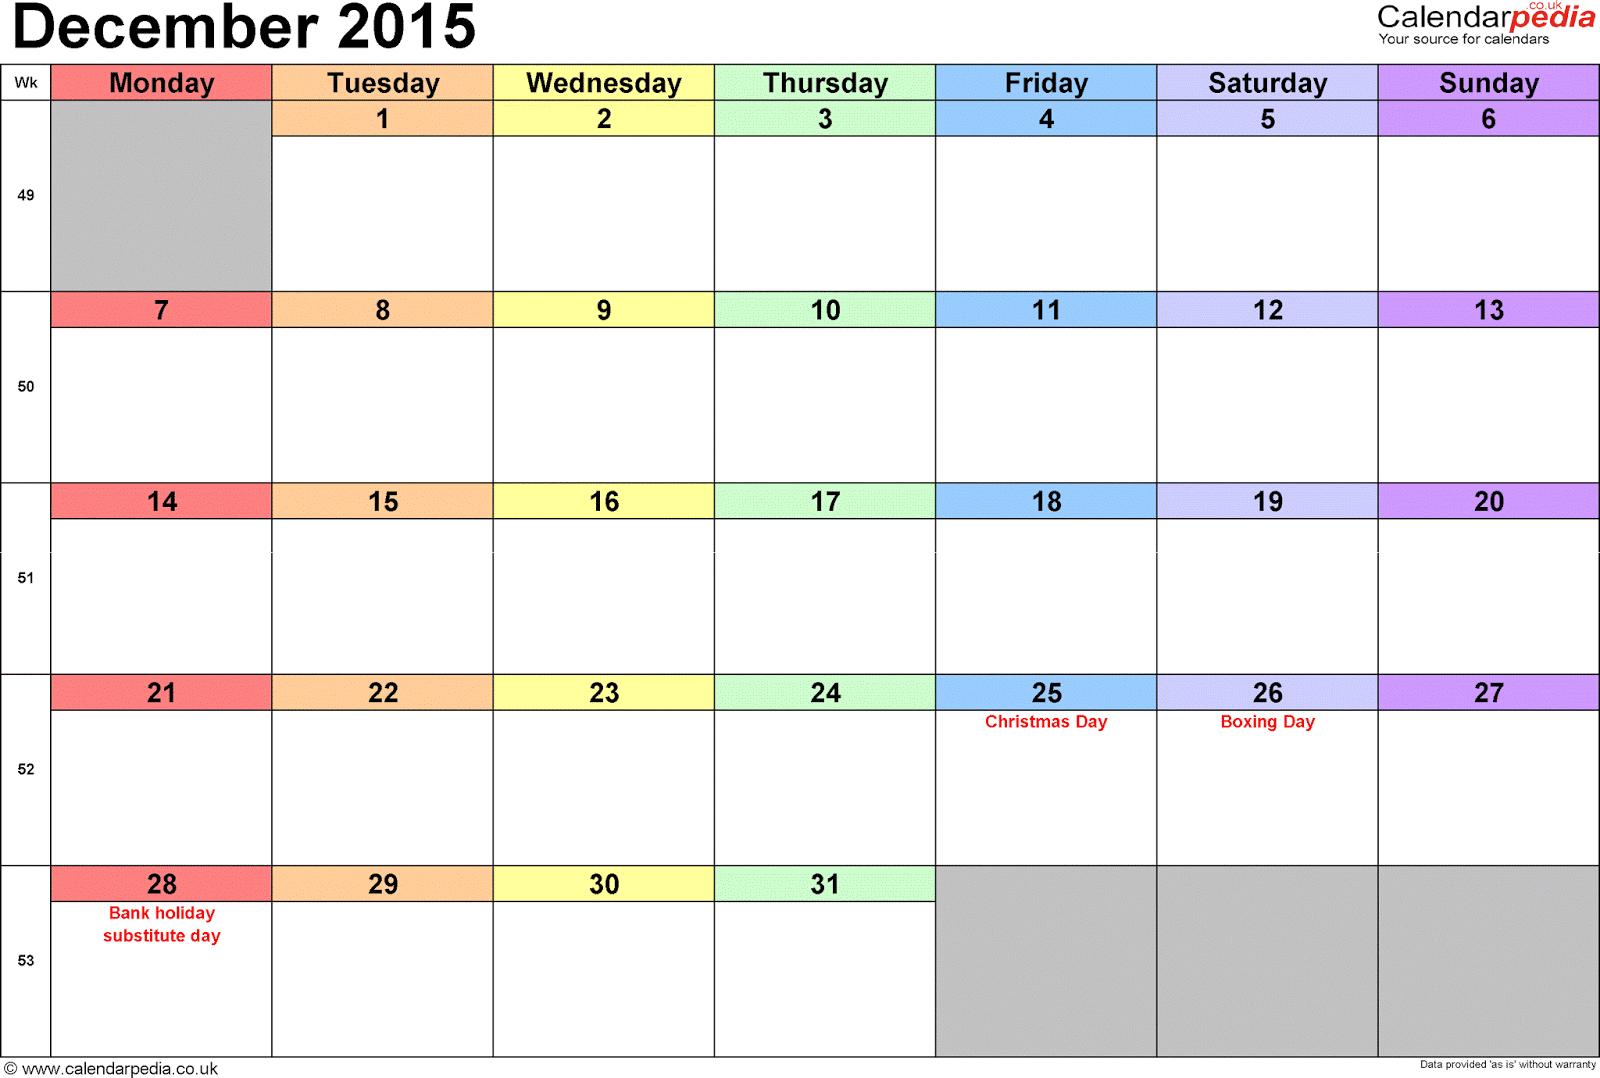 Free Printable 12 Month Calendar 2015 | LZK Gallery